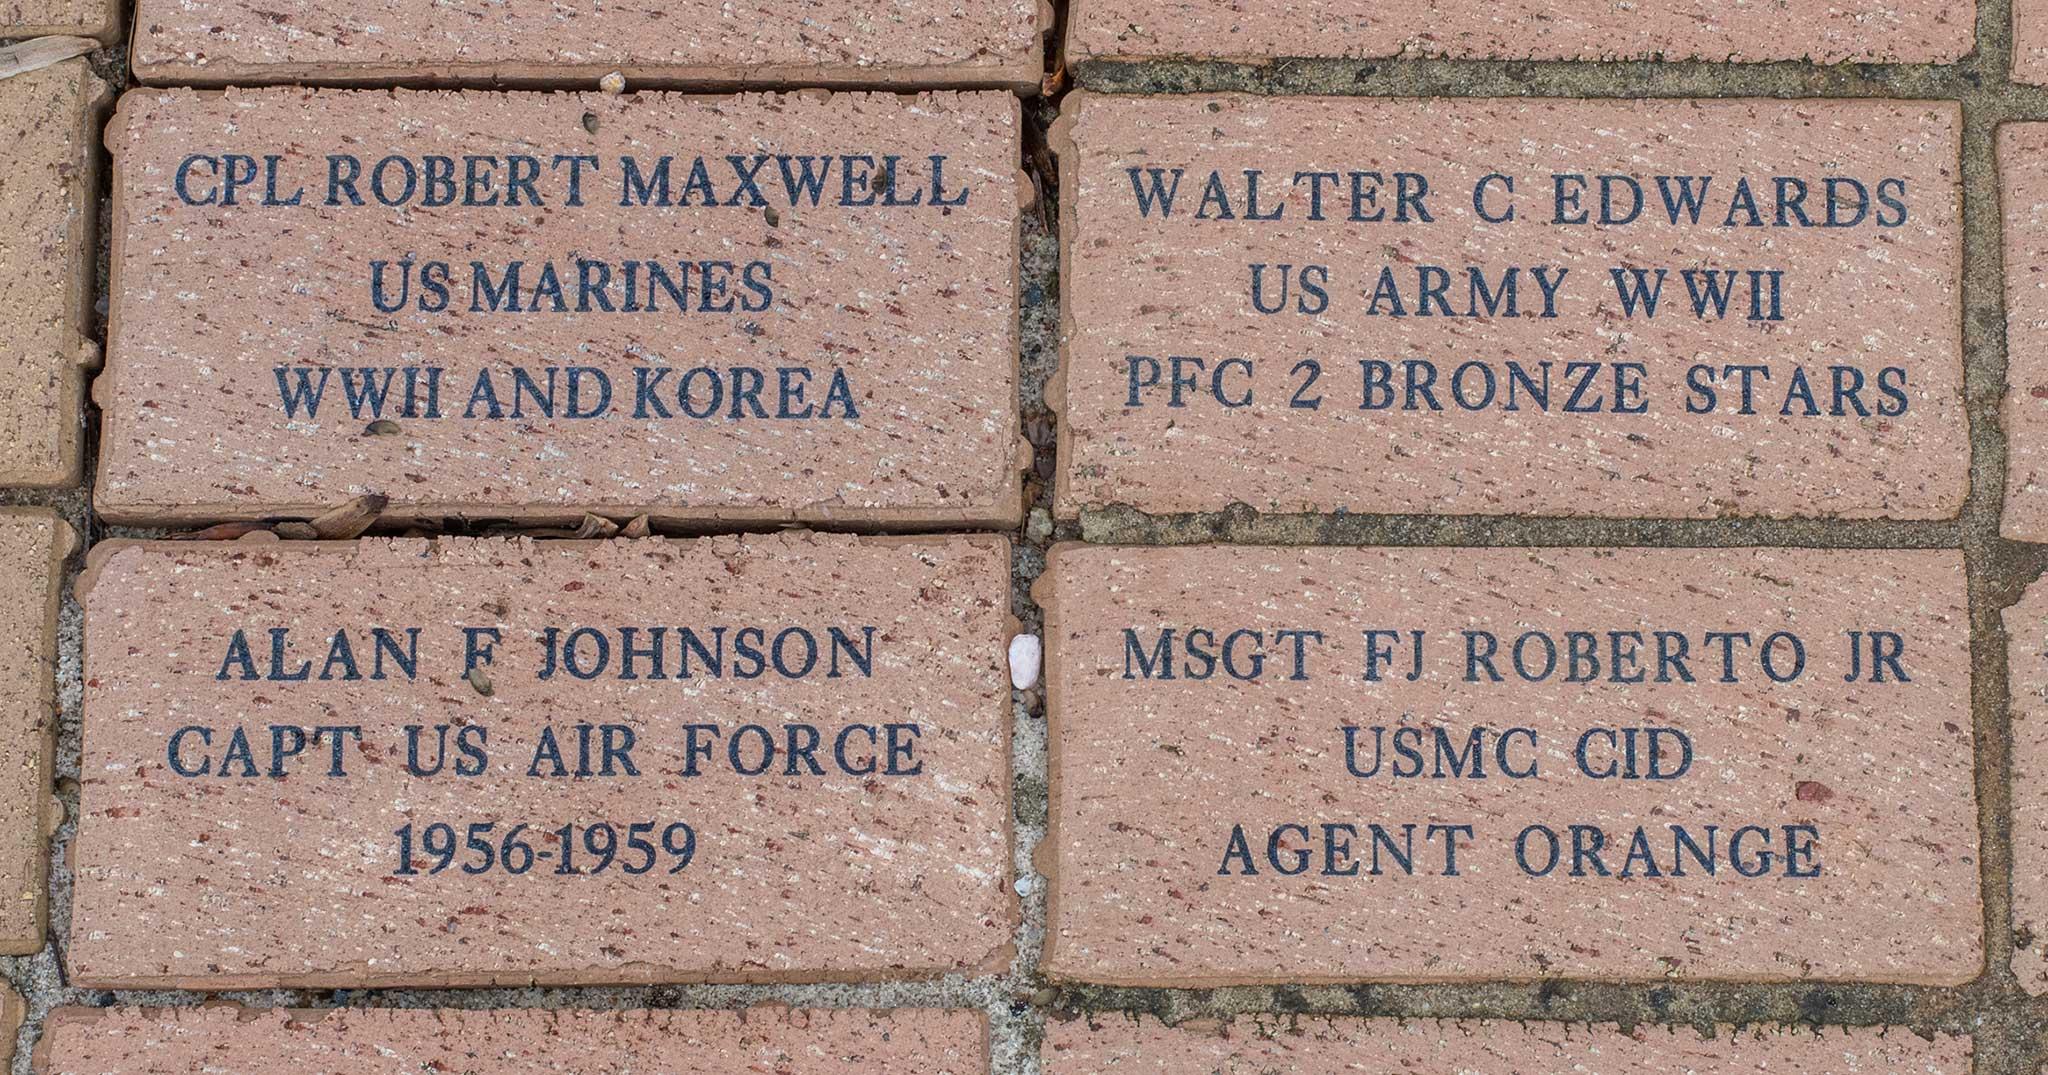 ALAN F JOHNSON CAPT US AIR FORCE 1956-1959